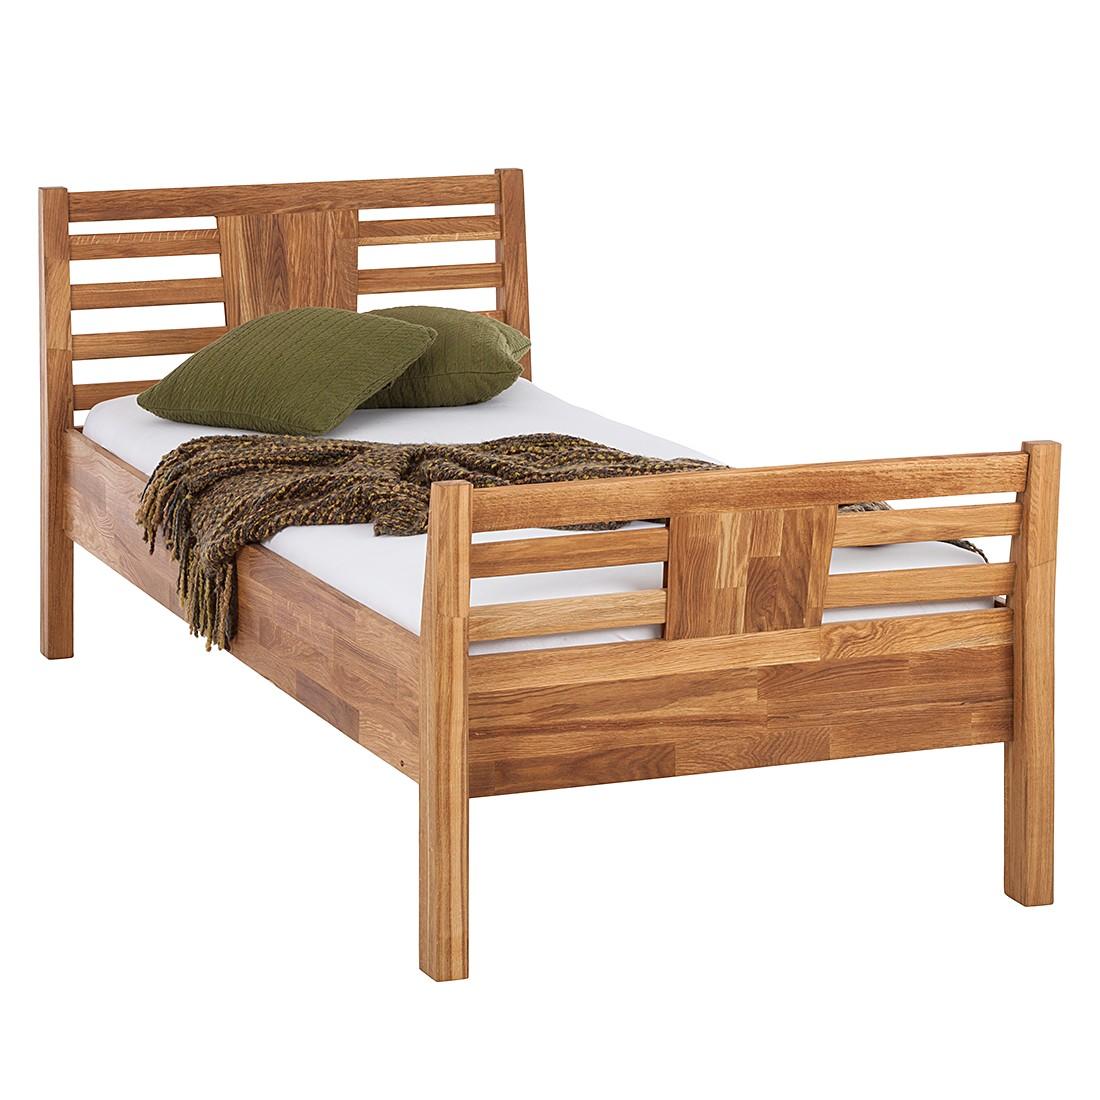 Energie A+, Comfortabel Bed Bari Massief Eikenhout 200 X 200CM Eik Led ...